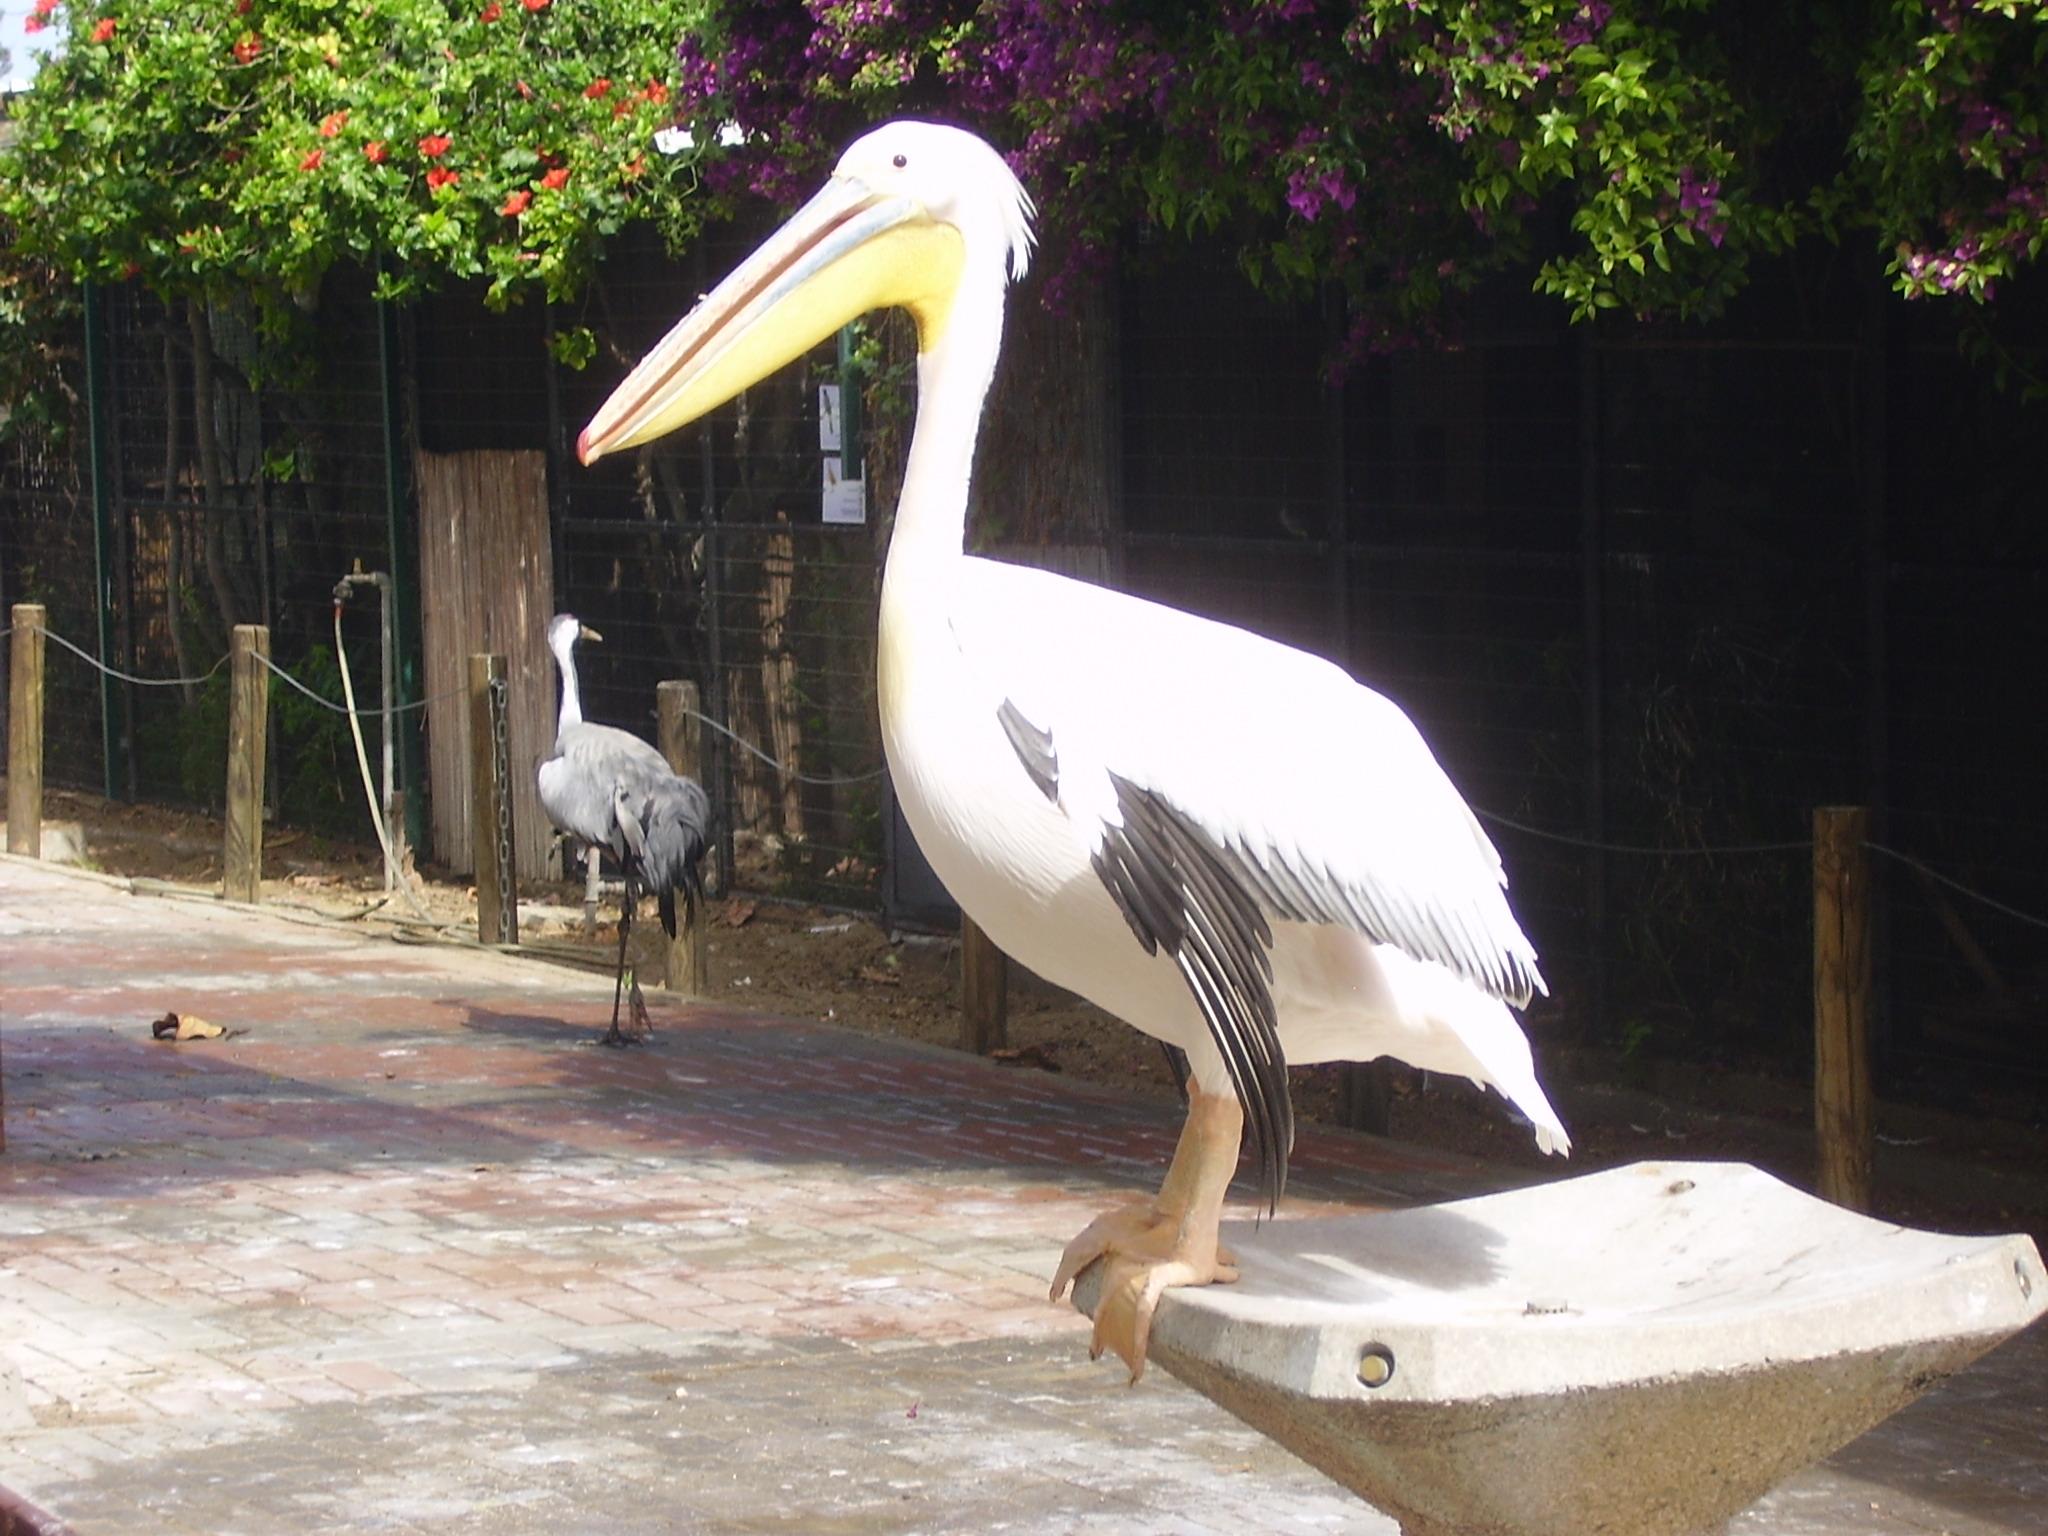 file pikiwiki israel 12904 cran pelican jpg wikimedia commons